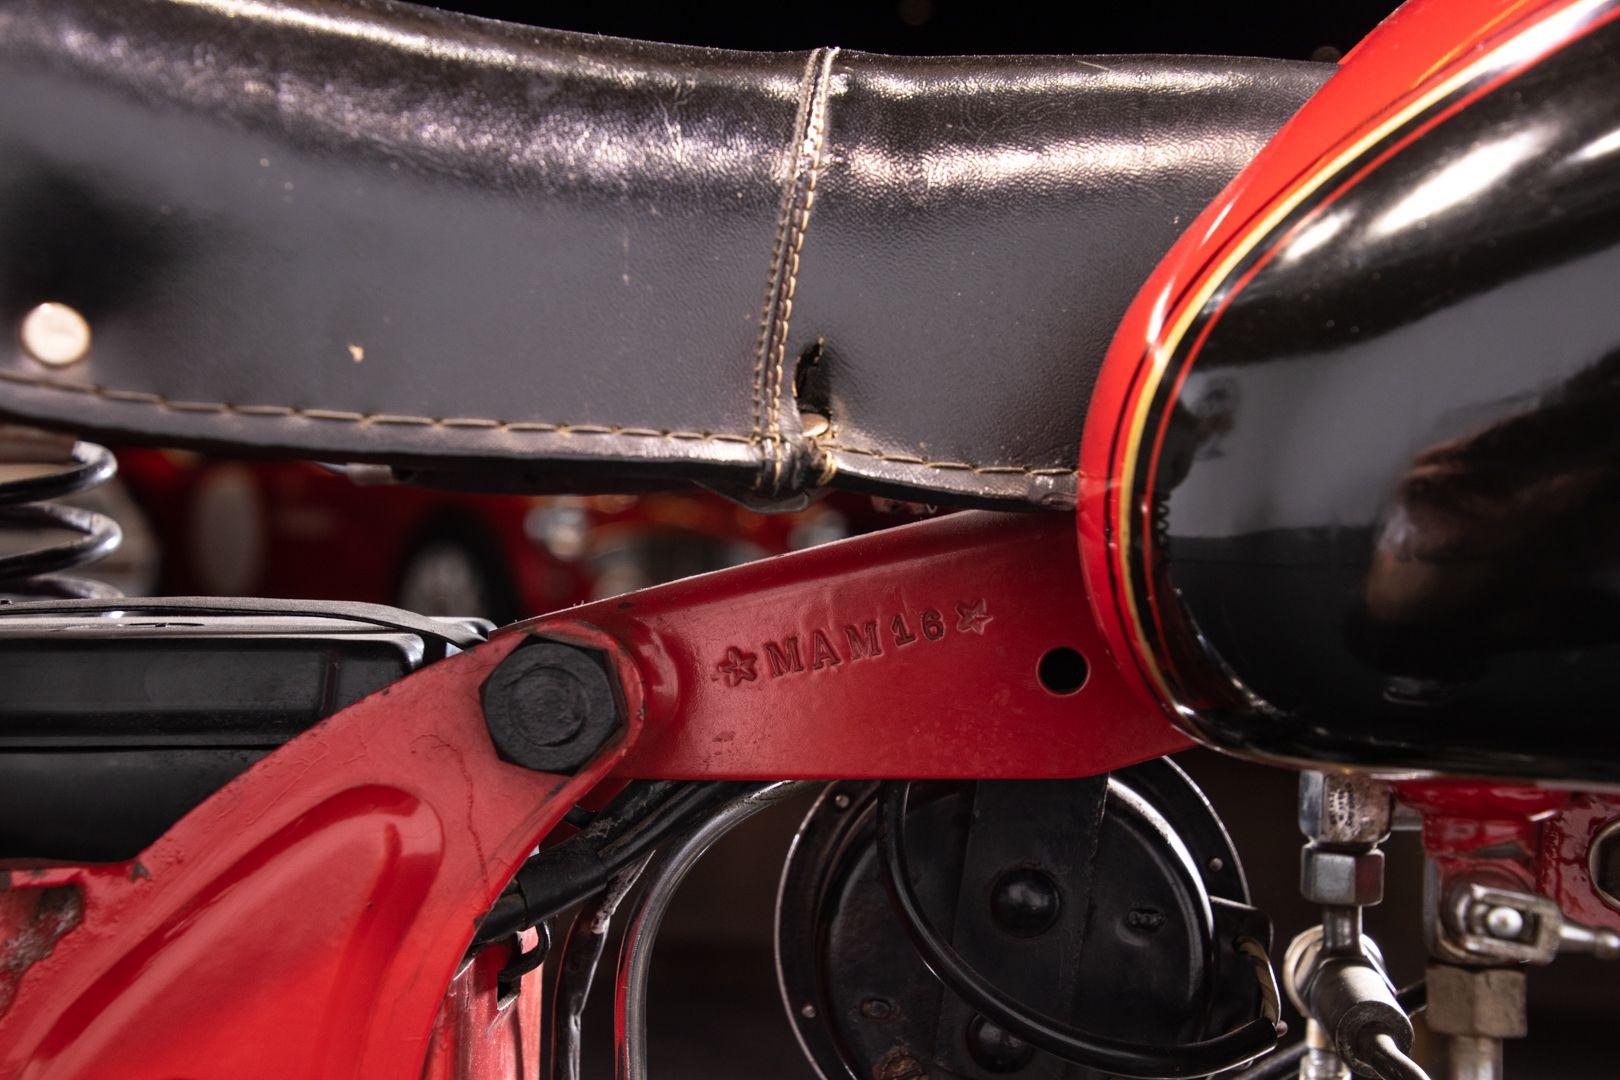 1954 Moto Guzzi Airone Sport 250 39125